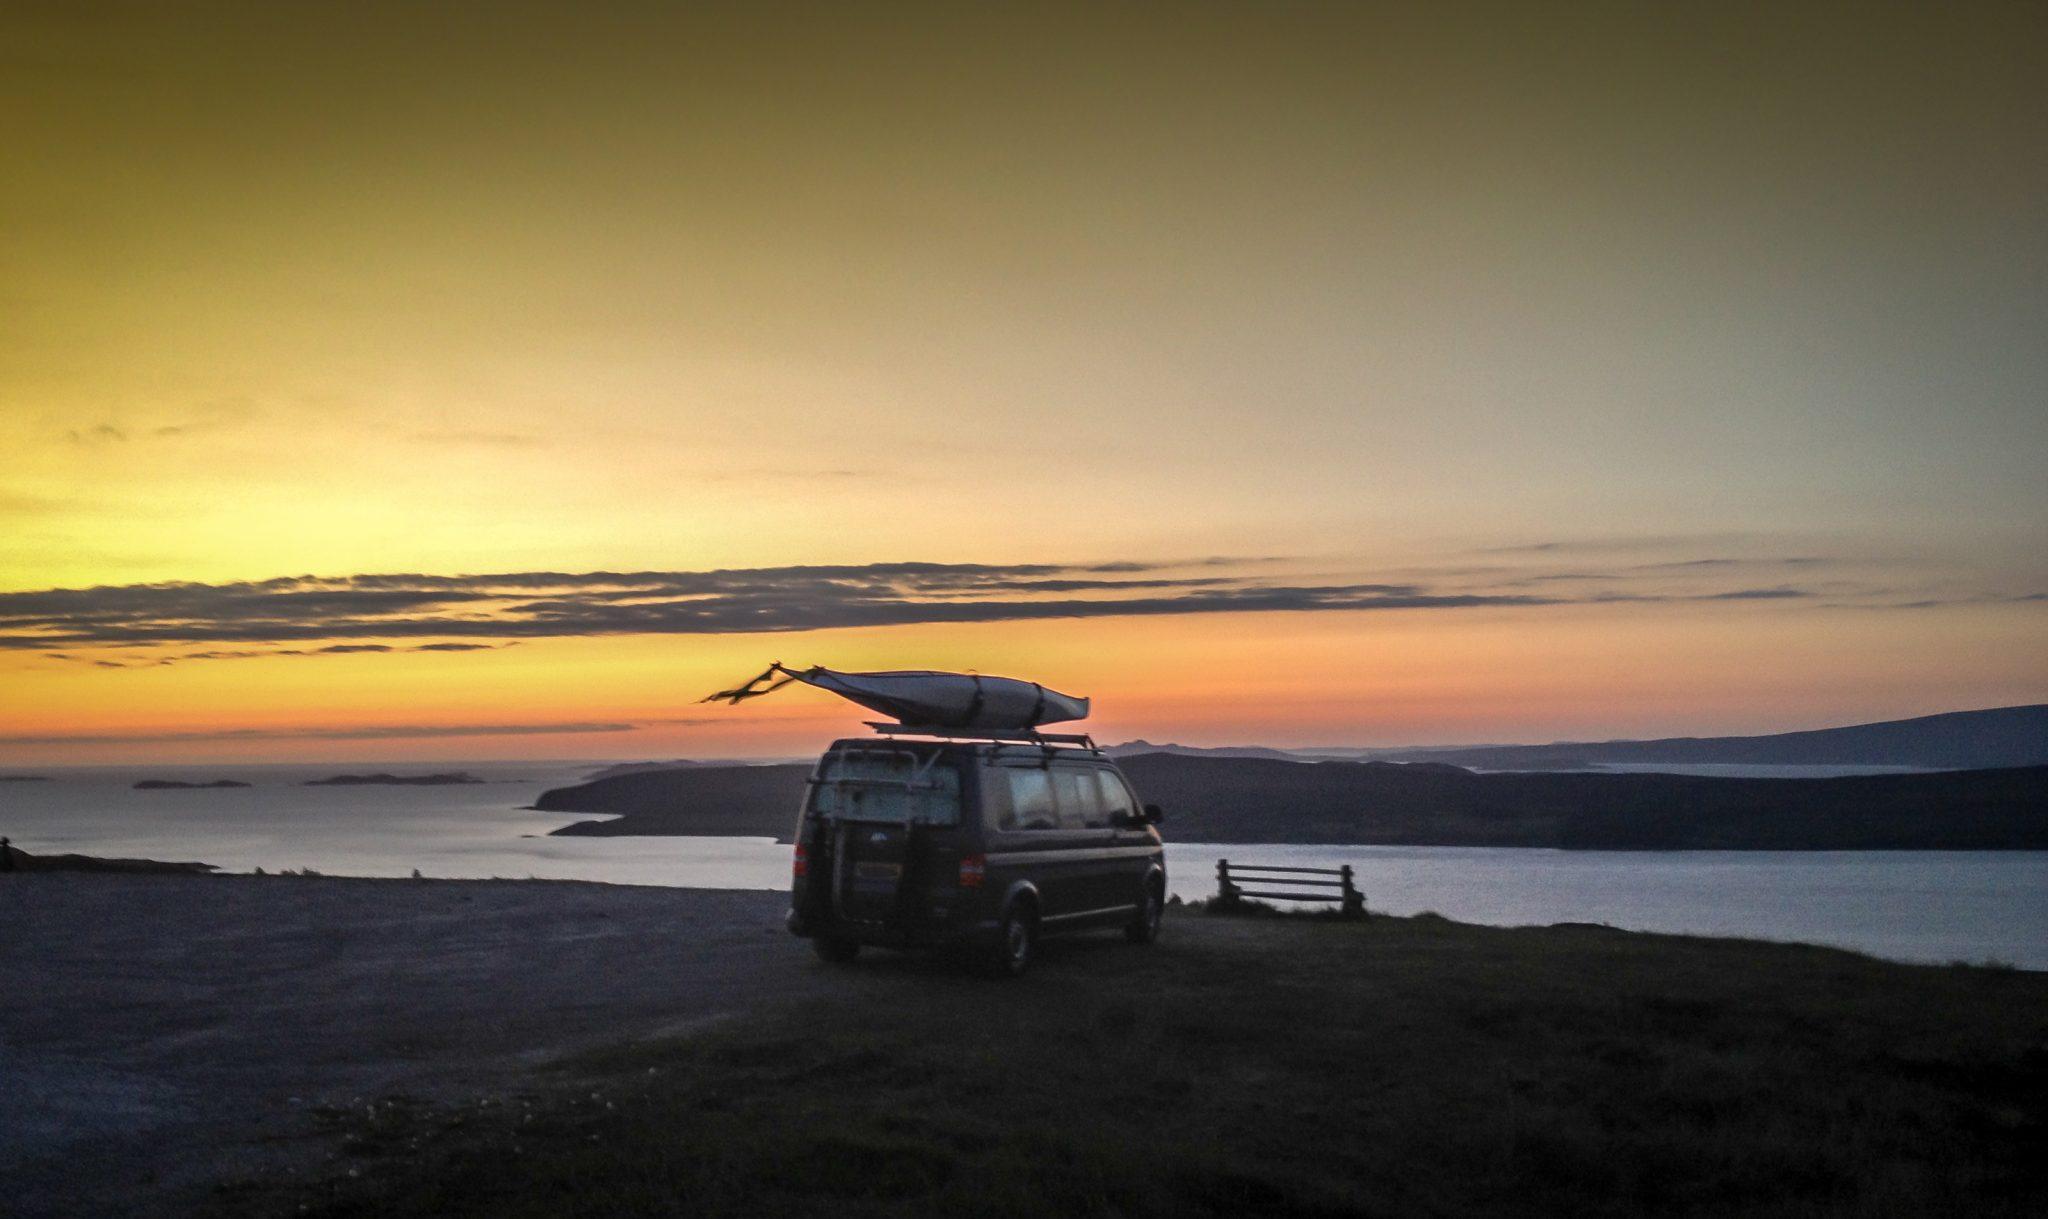 Campervan Sunset